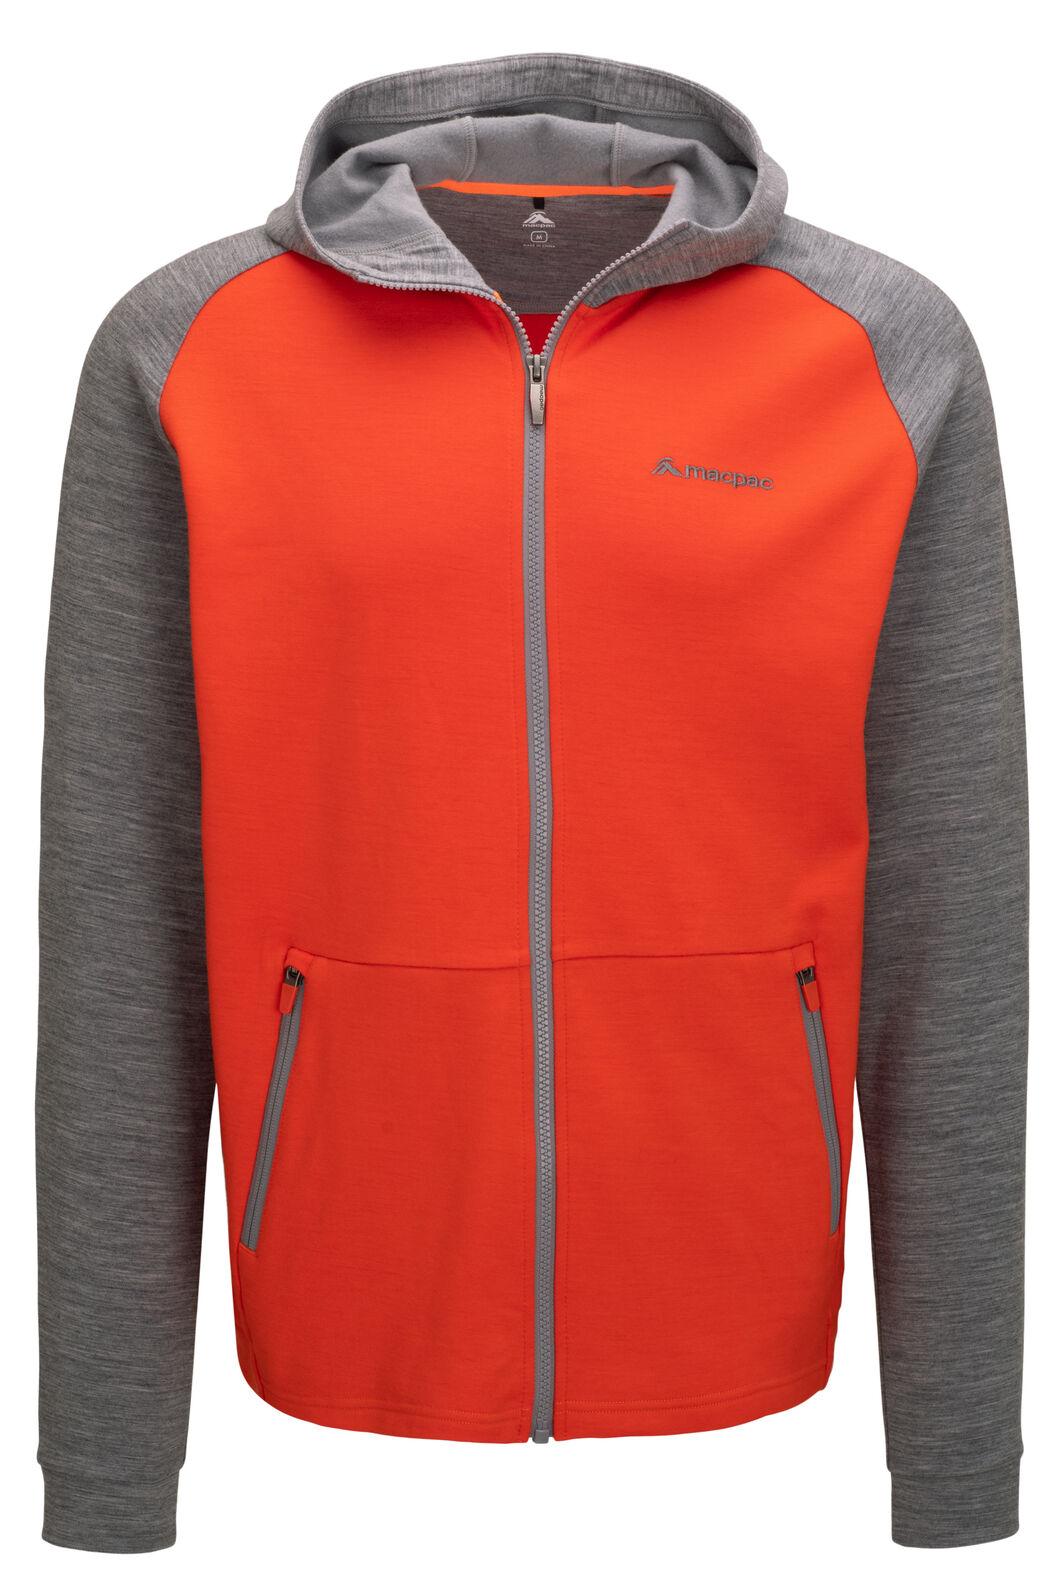 Macpac Men's Craigieburn 280 Merino Blend Hooded Jacket, Pureed Pumpkin, hi-res